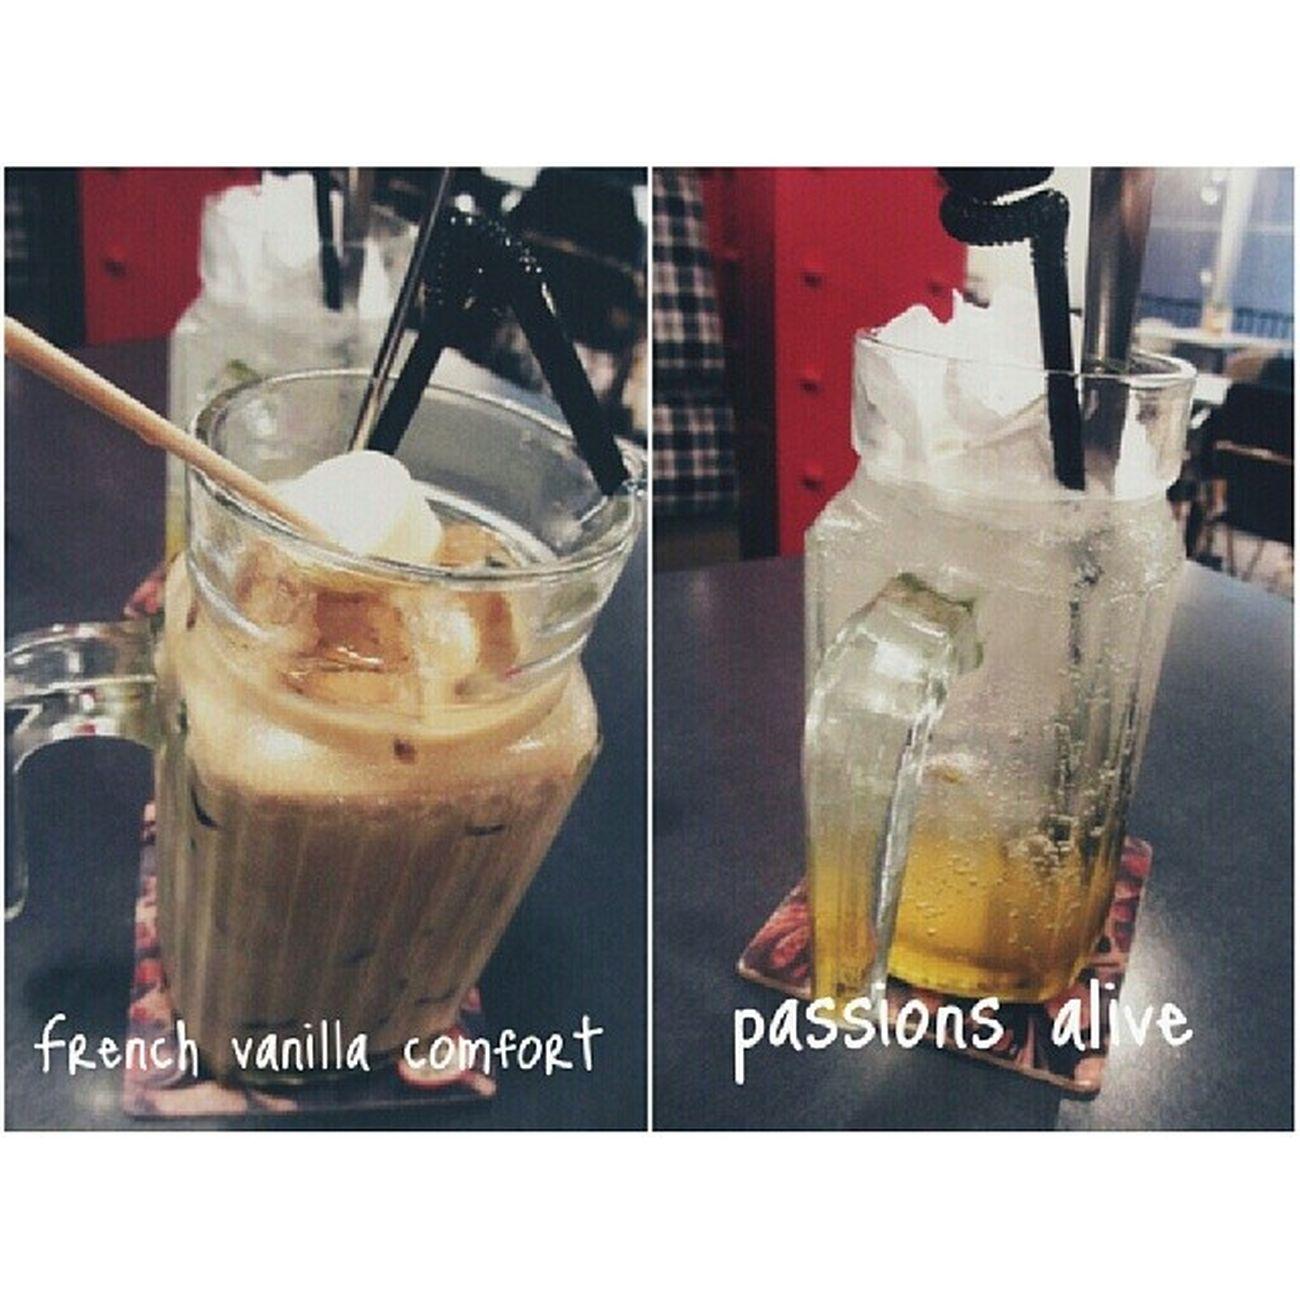 Havealittlebrotherworksthereandthebilldiscounts20 Kelzyuadatewithfood Latte Nydc again